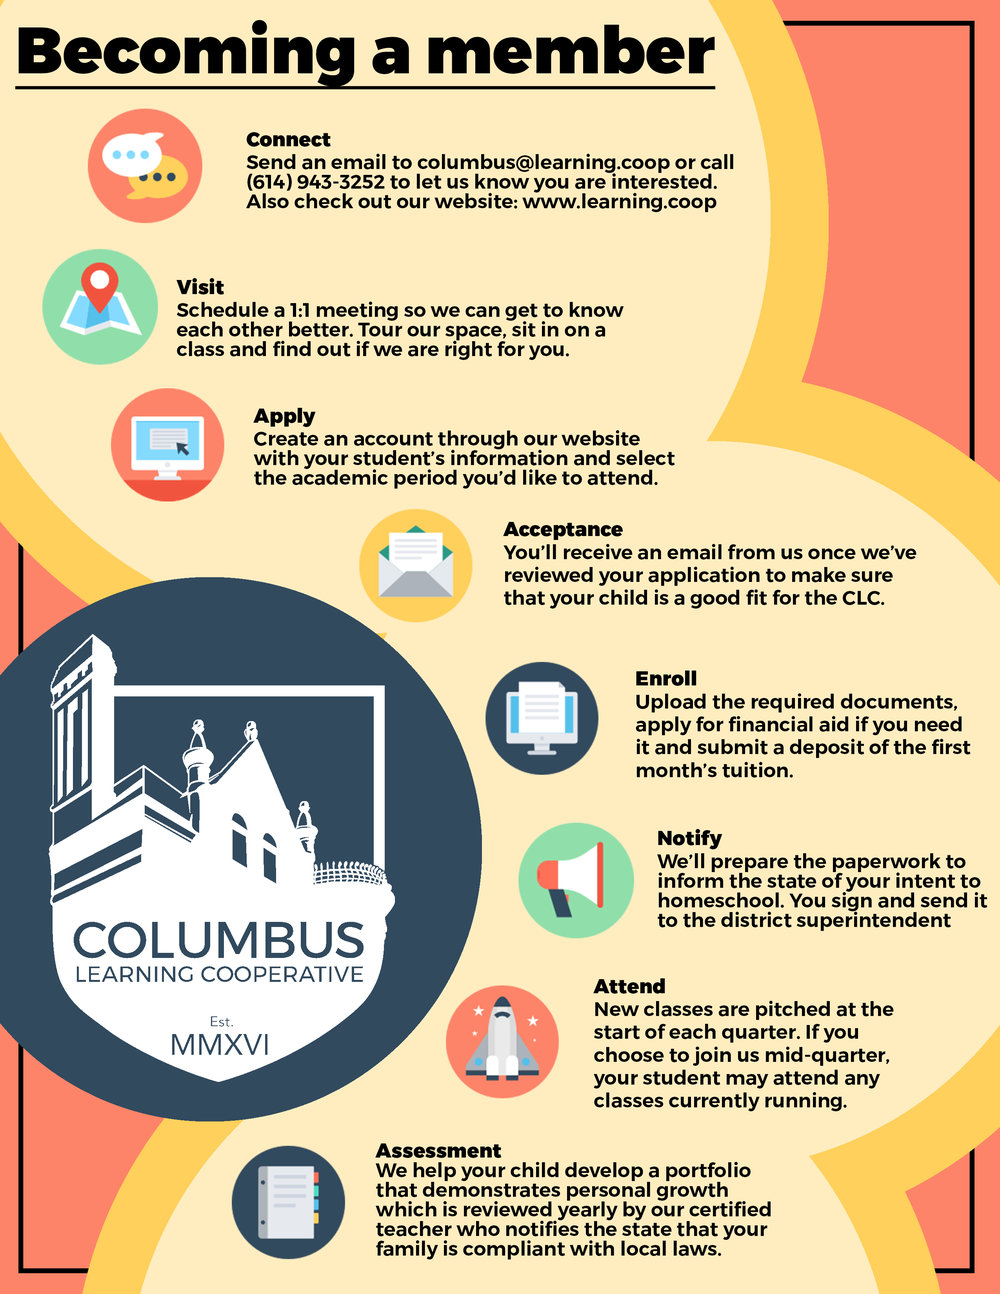 Enrollment_Columbus_Learning.jpeg